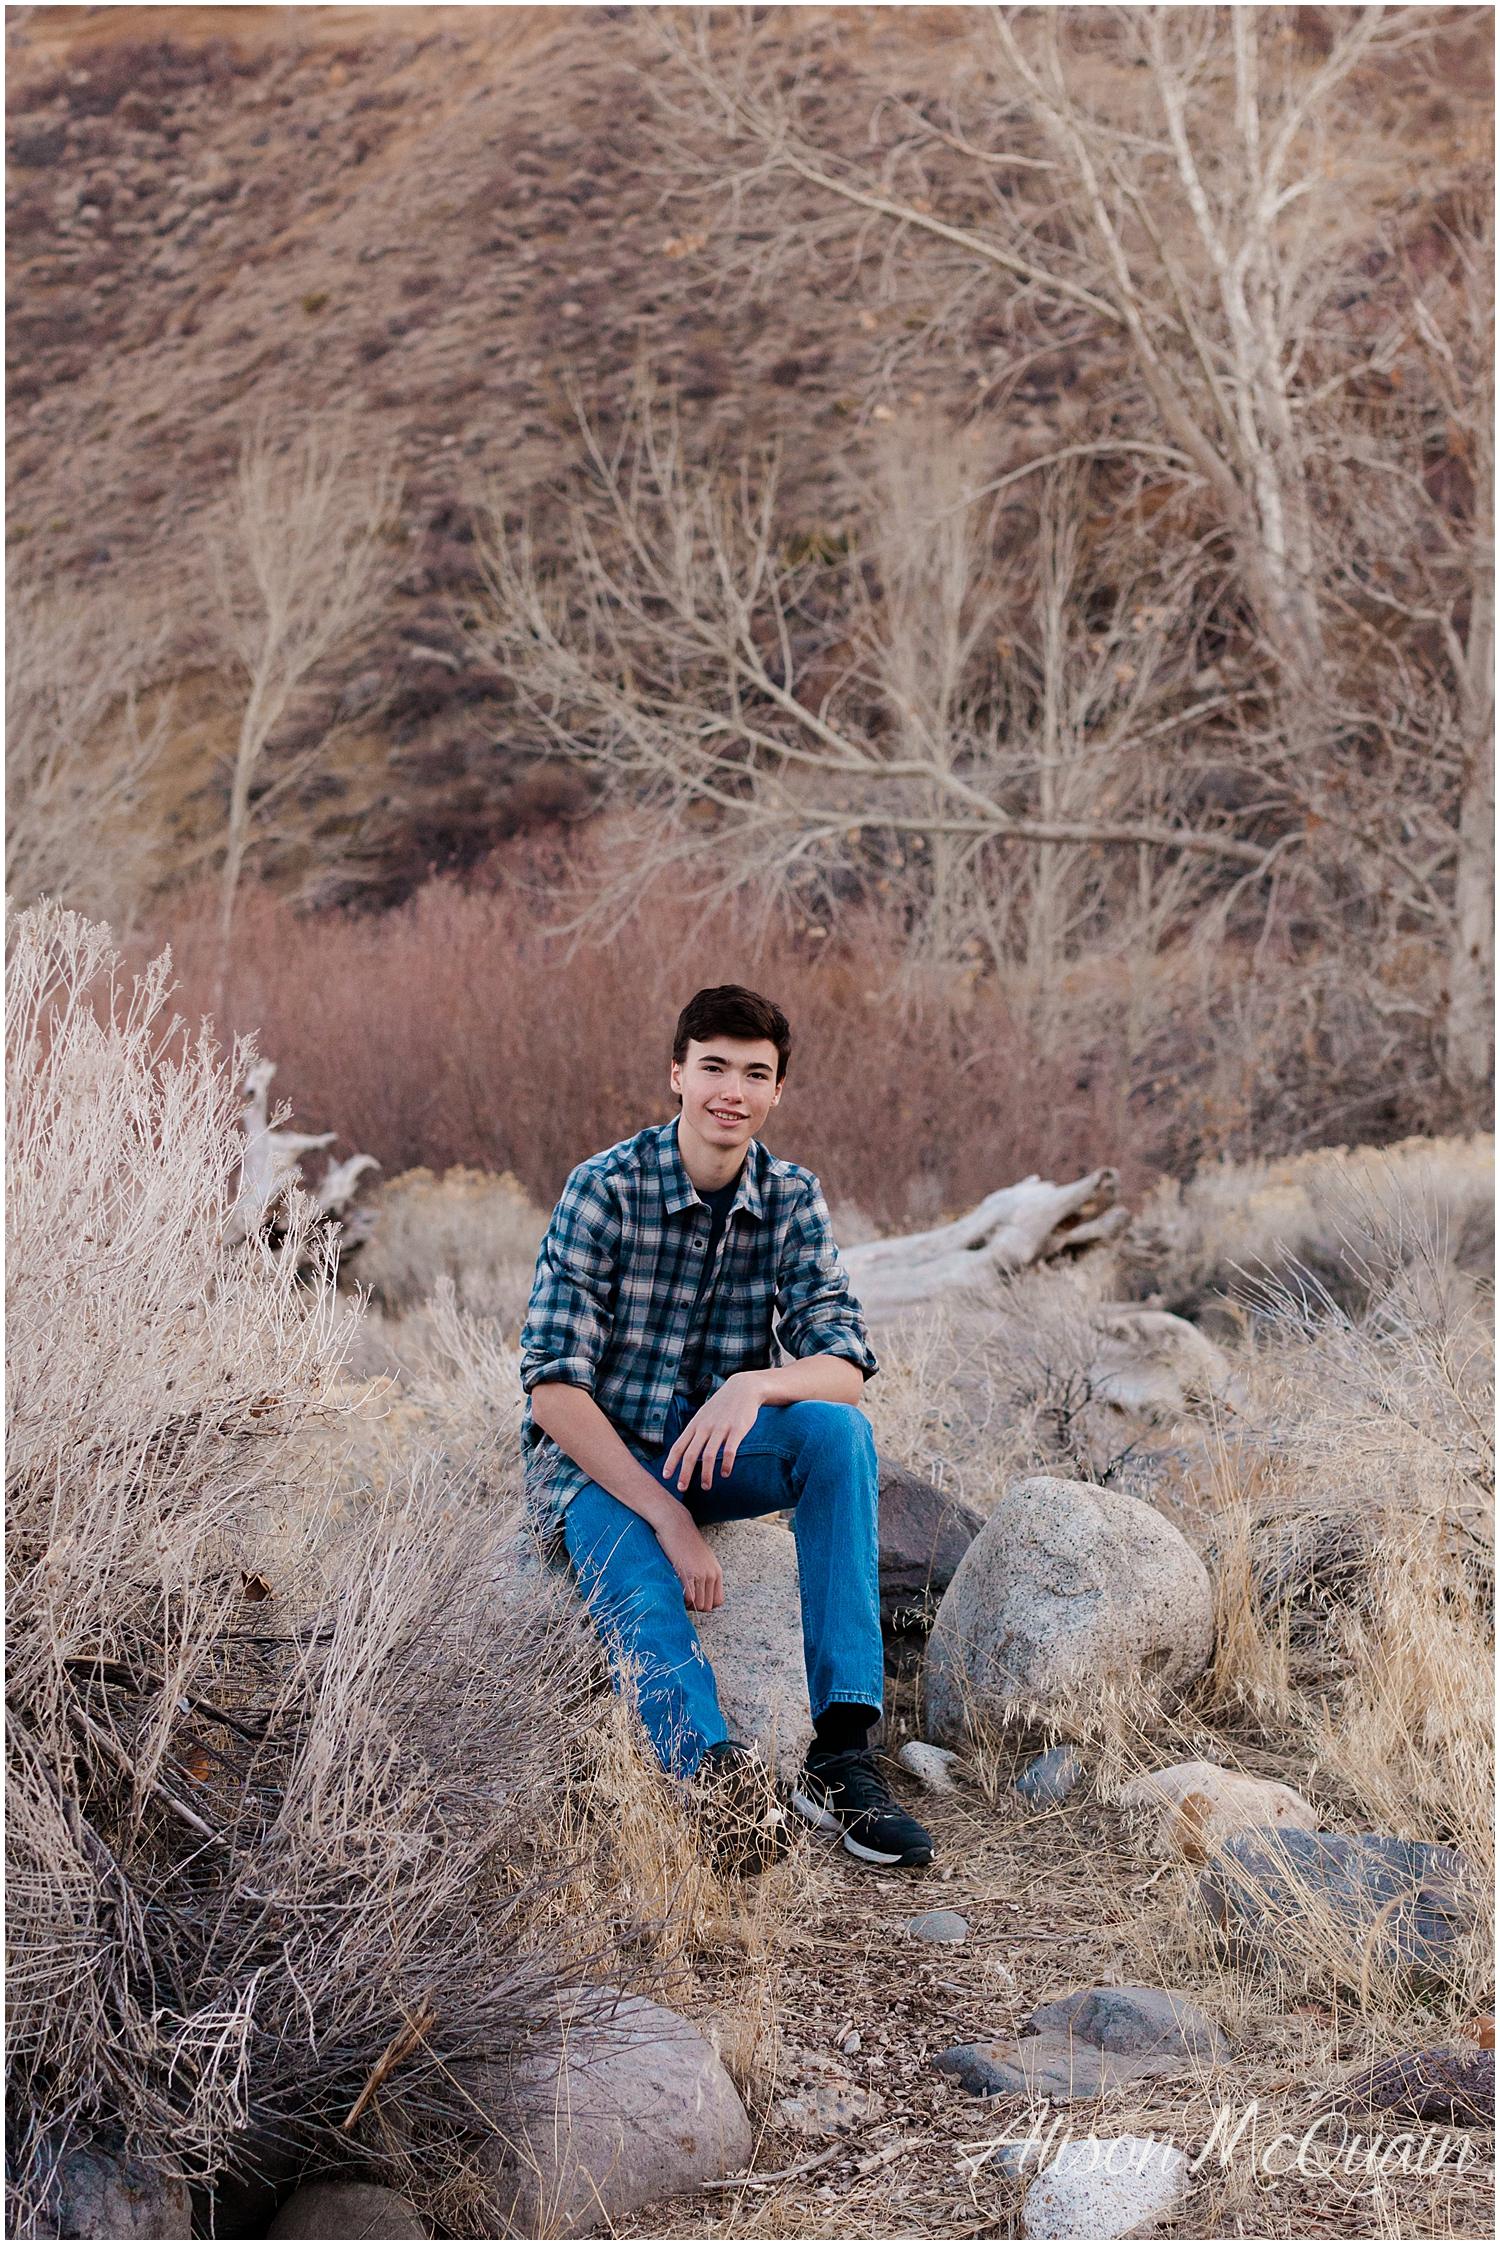 Jack_Senior_Portraits_Reno_NV_01_2019_AlisonMcQuainPhotography_0006.jpg